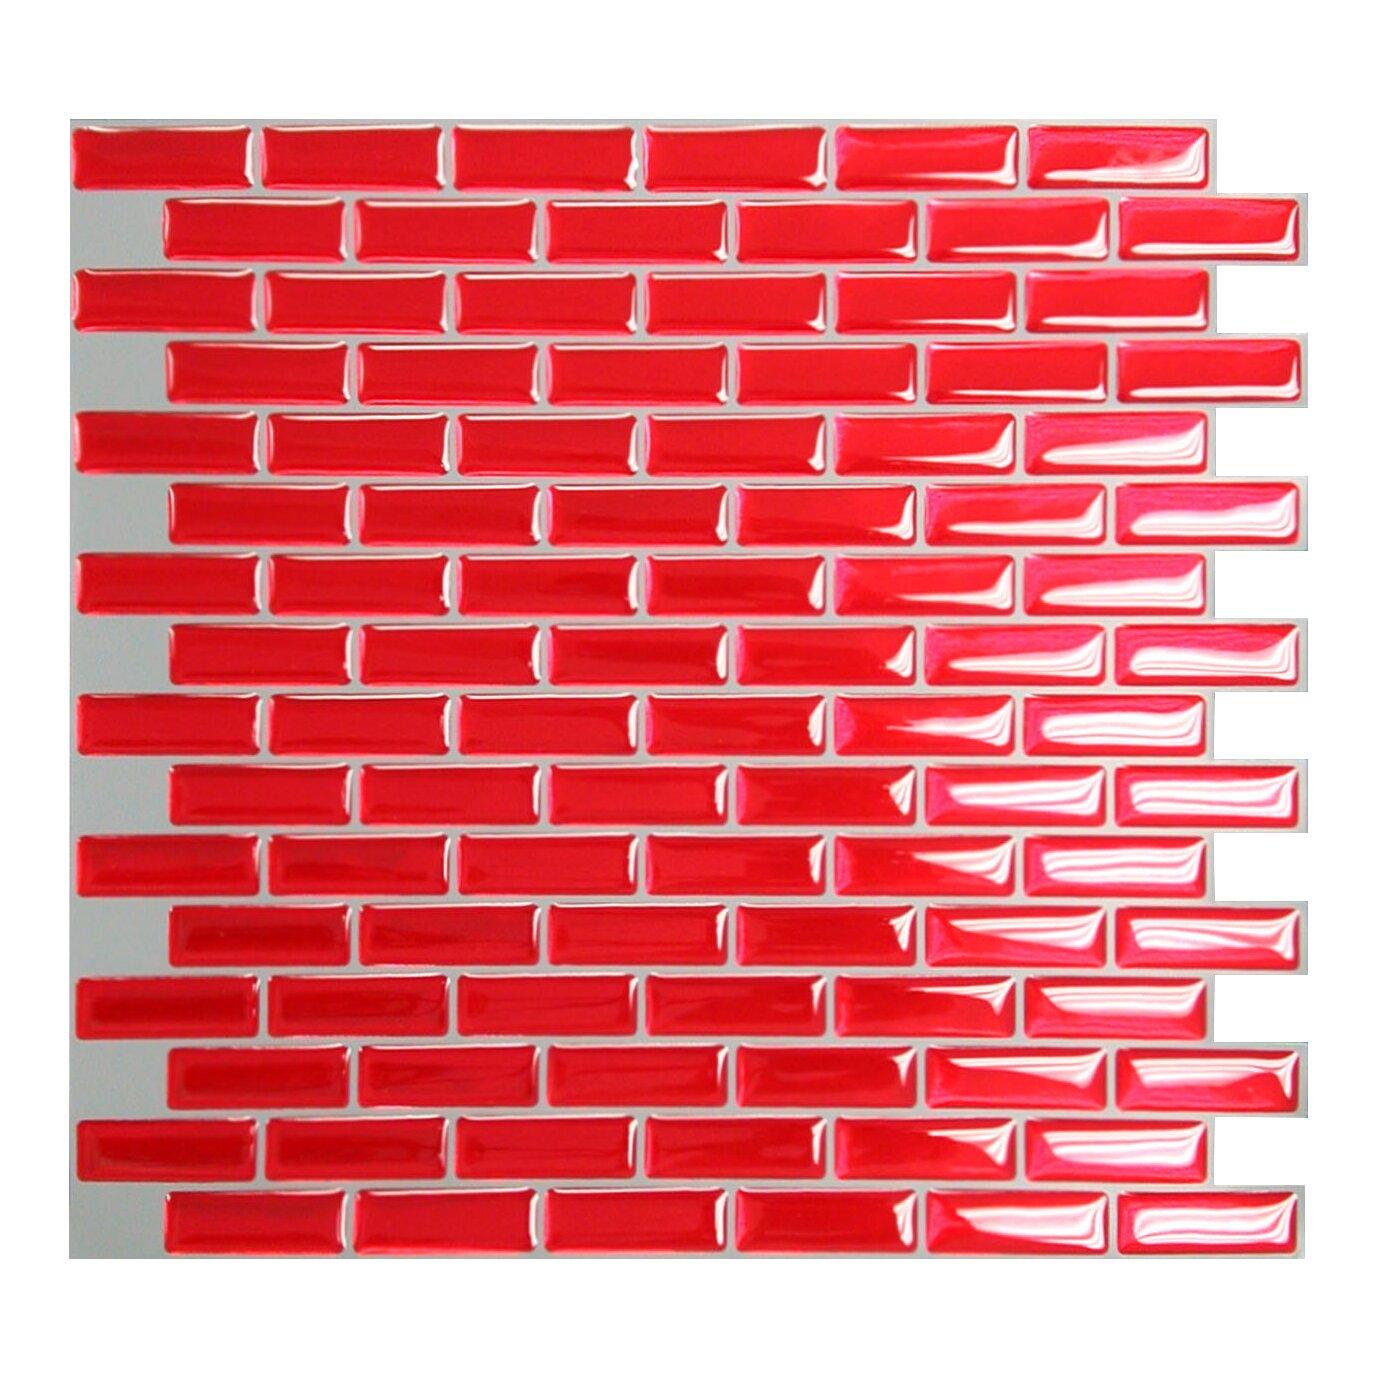 smart tiles mosaik murano cosmo x peel stick wall tile in red reviews wayfair. Black Bedroom Furniture Sets. Home Design Ideas